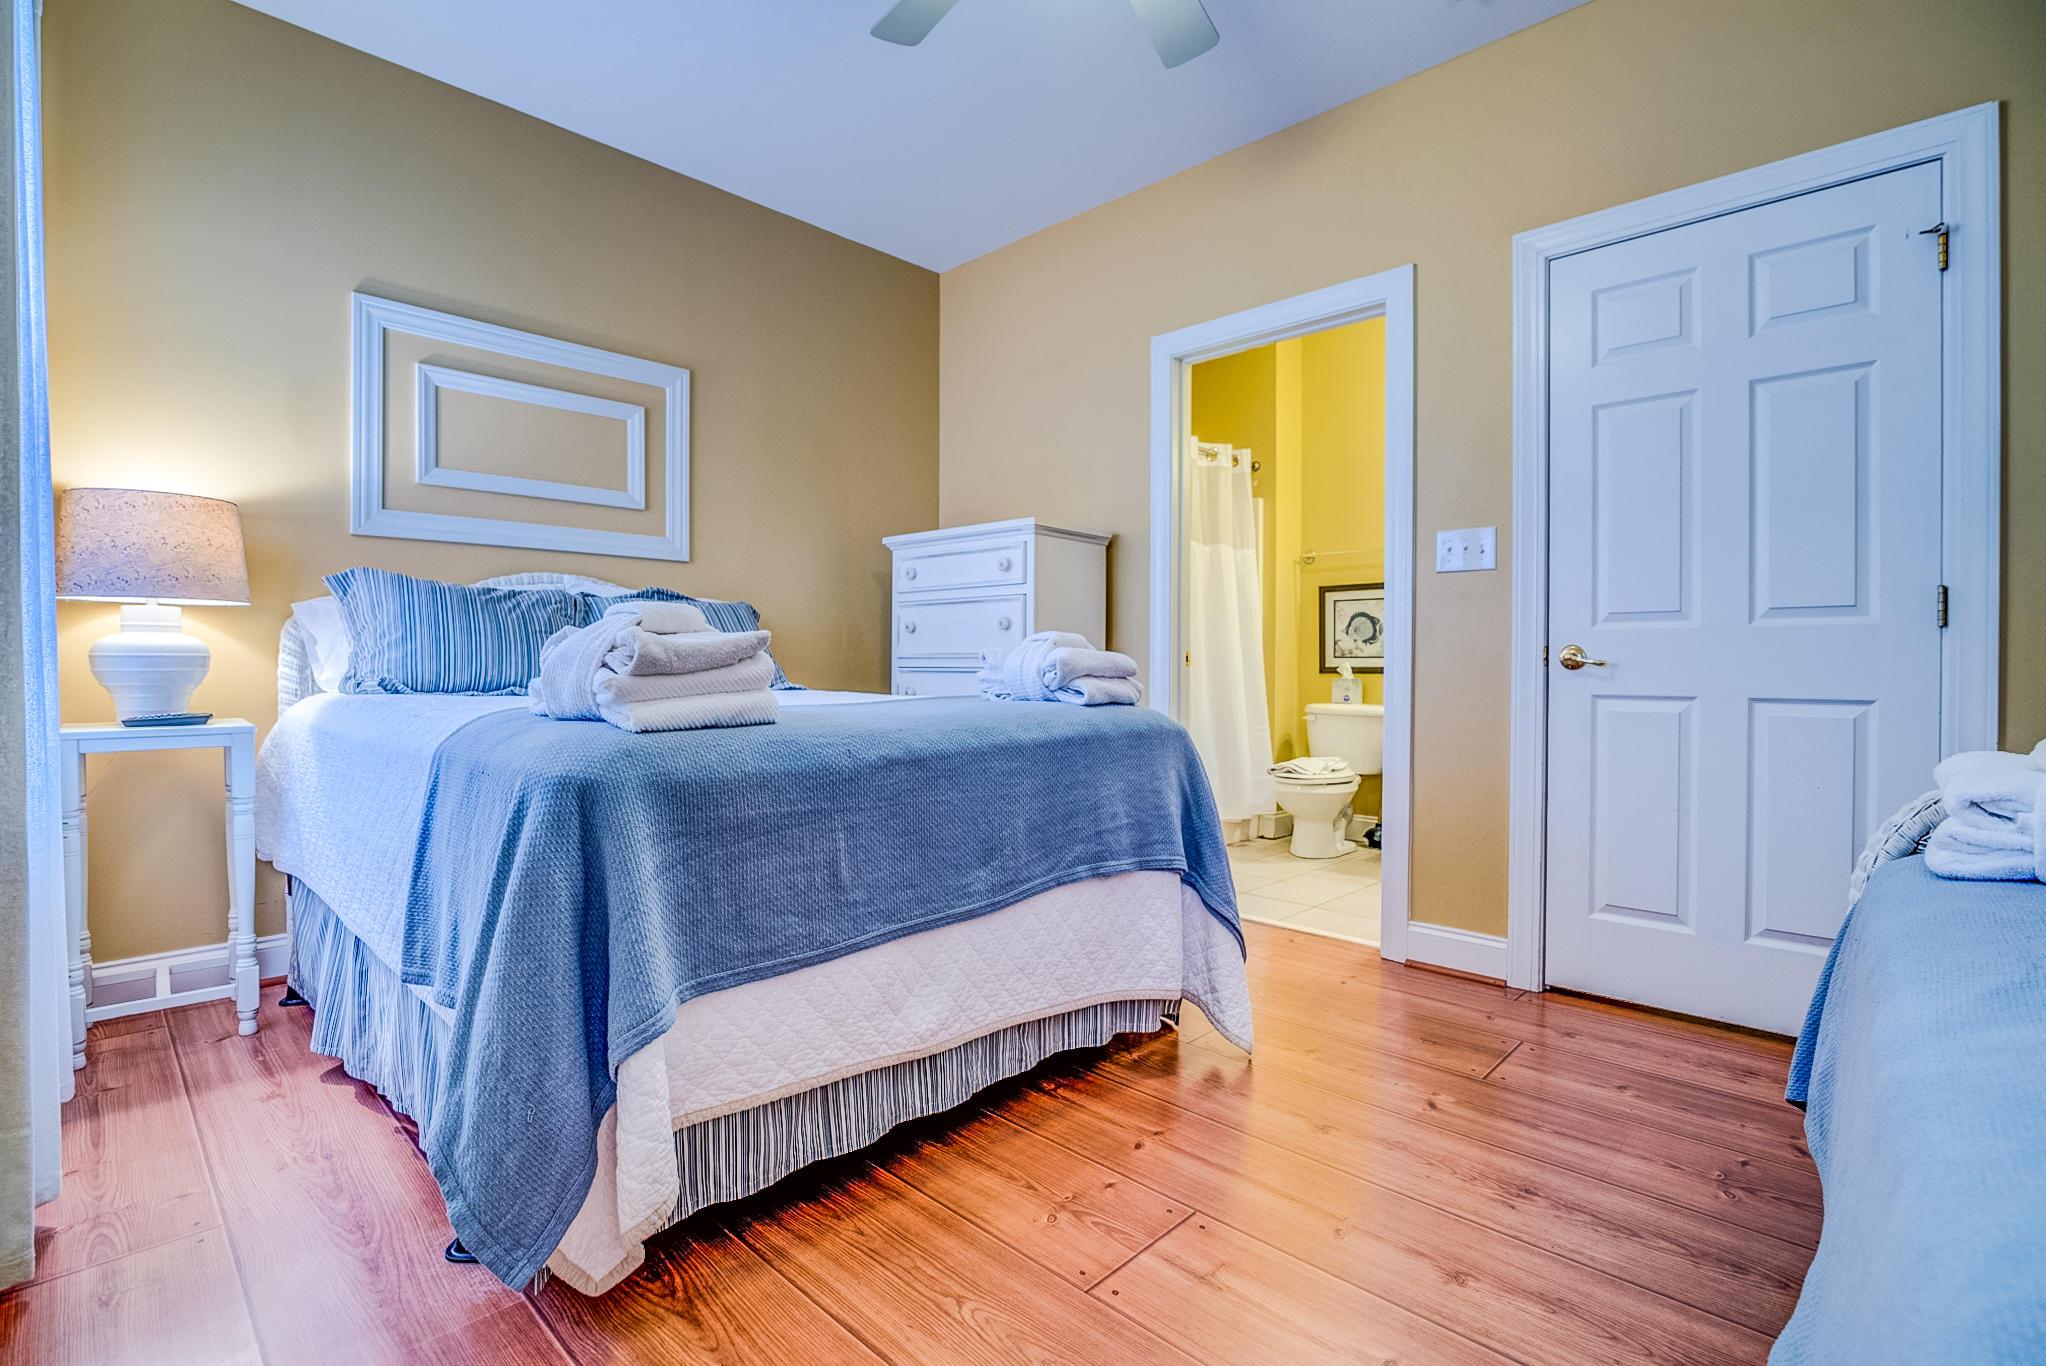 Ocean Pointe Villas Homes For Sale - 214 Arctic, Folly Beach, SC - 16